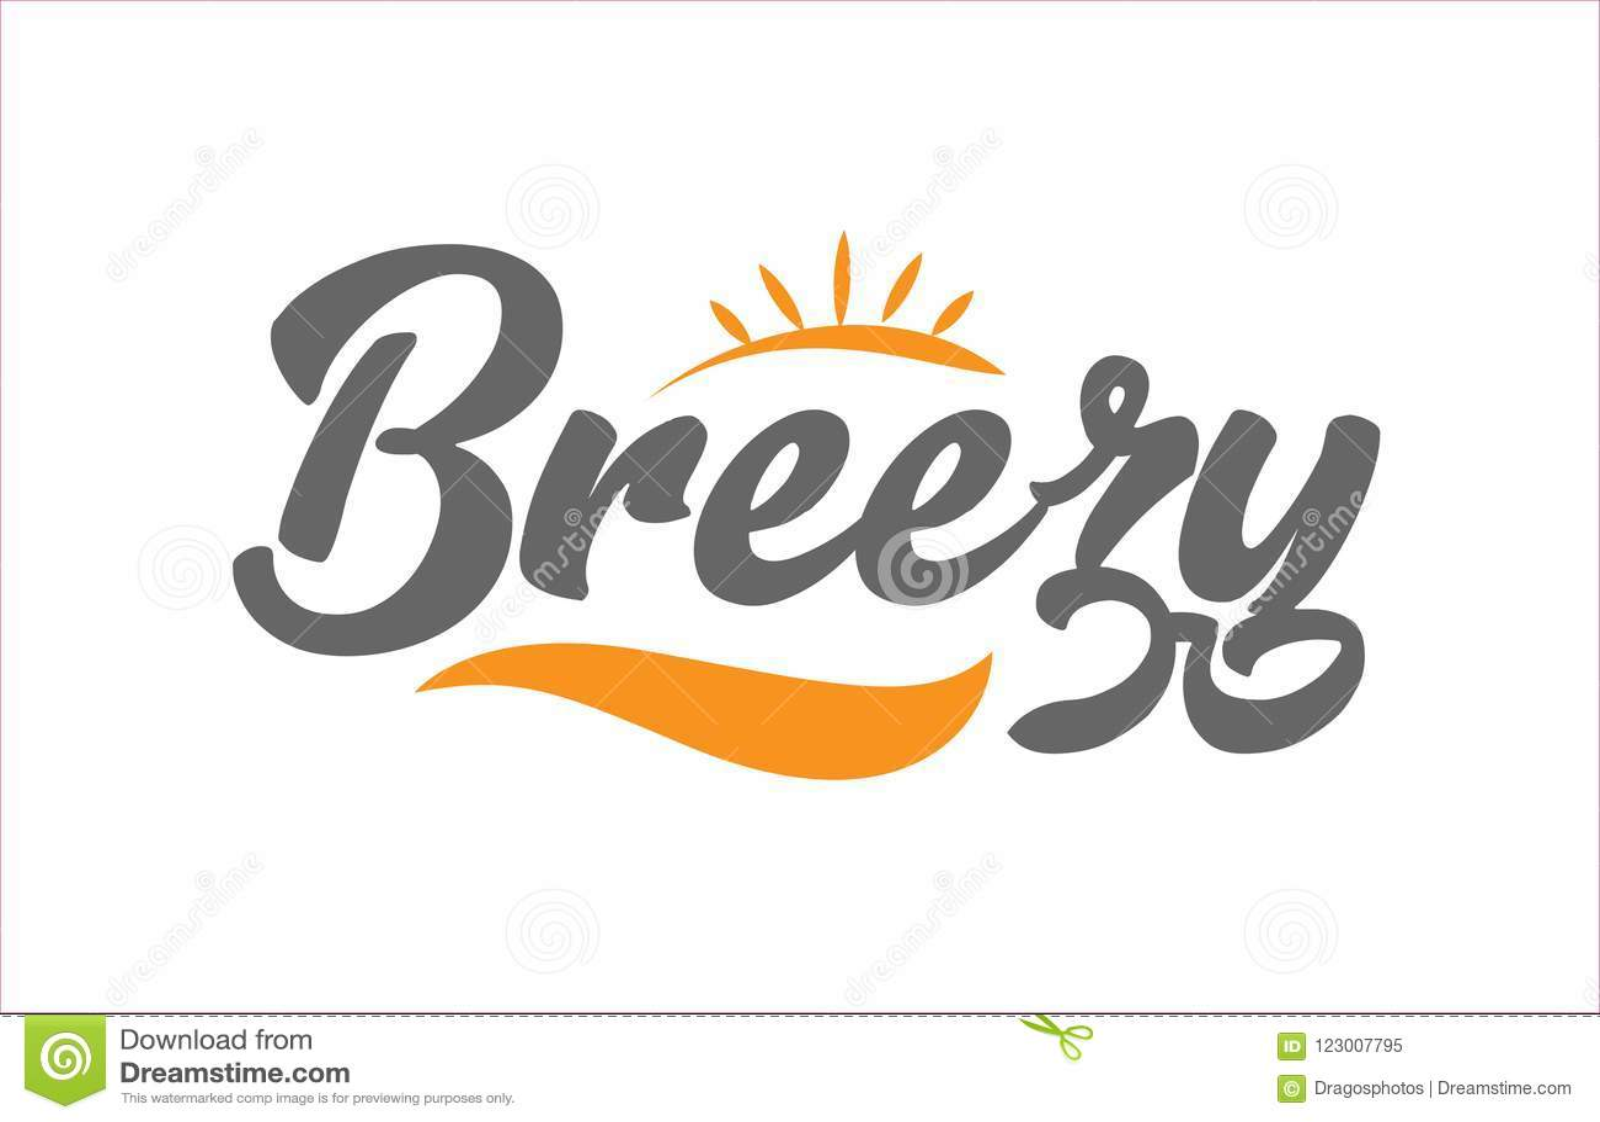 breezy black hand writing word text typography design logo icon